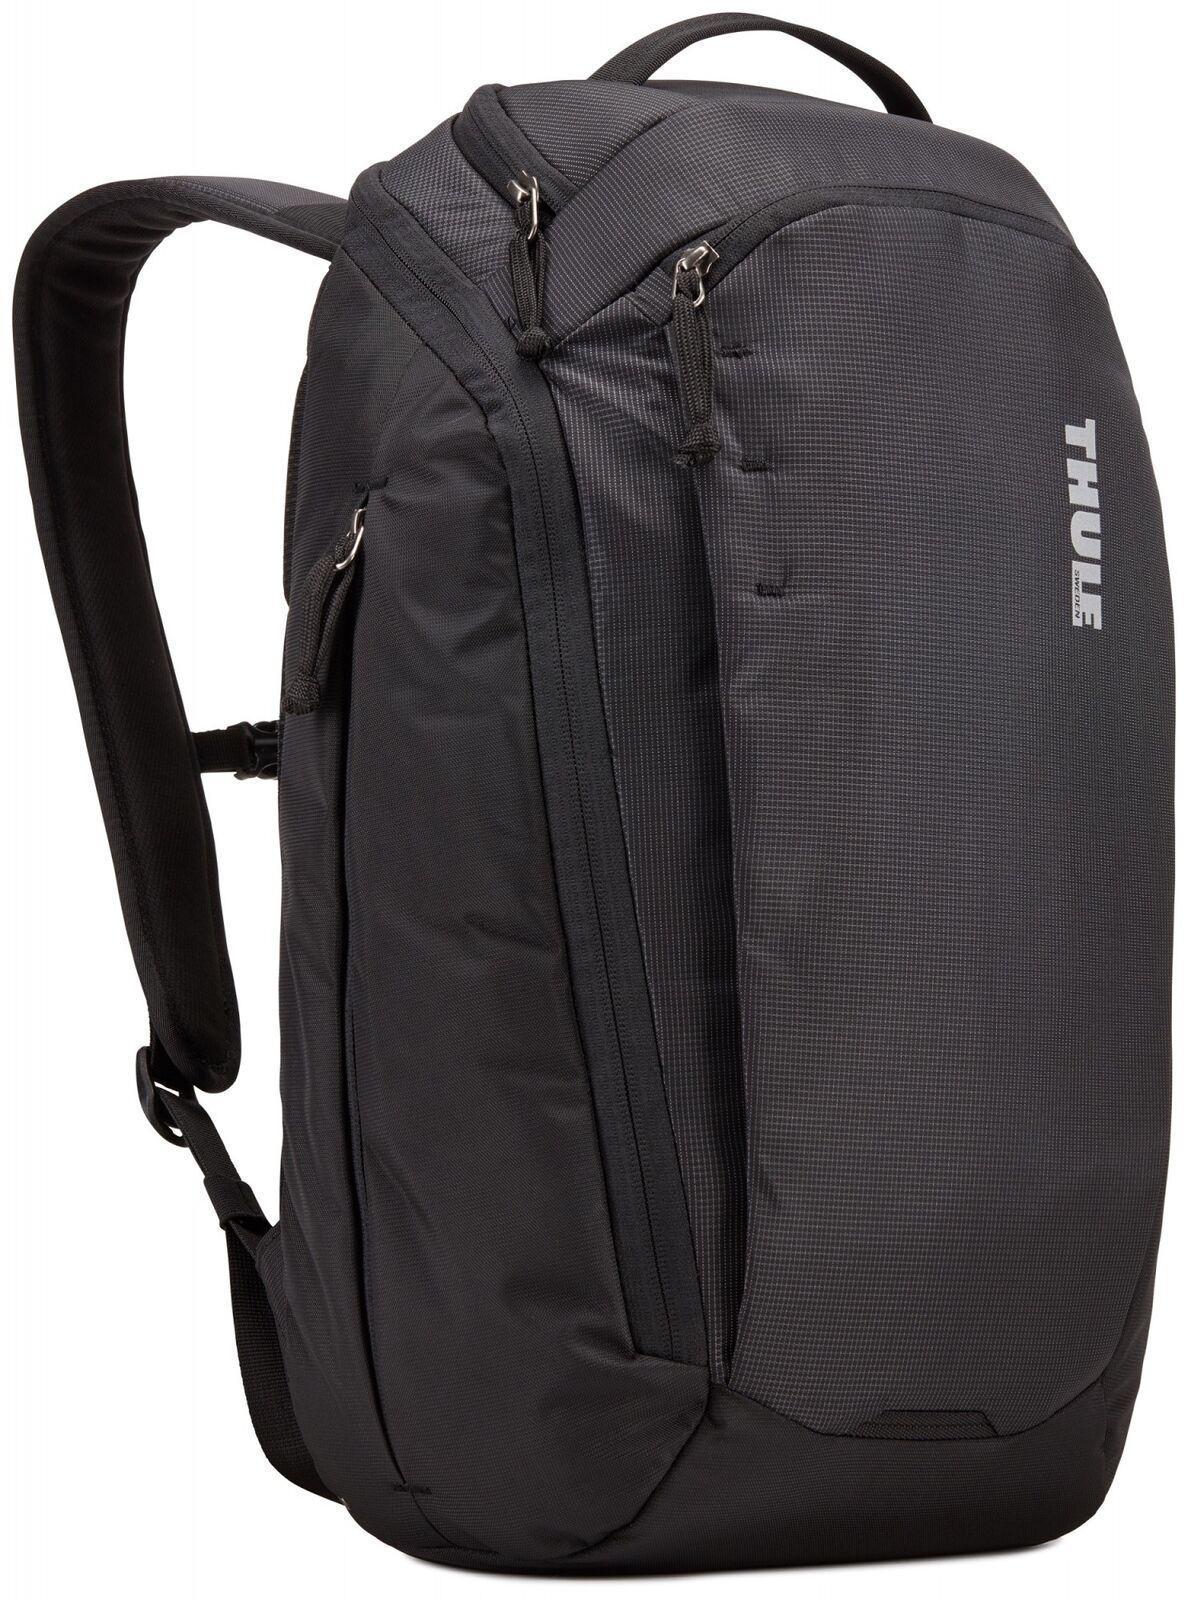 Thule Rucksack EnRoute 23 L Daypack Tagesrucksack Laptoprucksack Schulrucksack